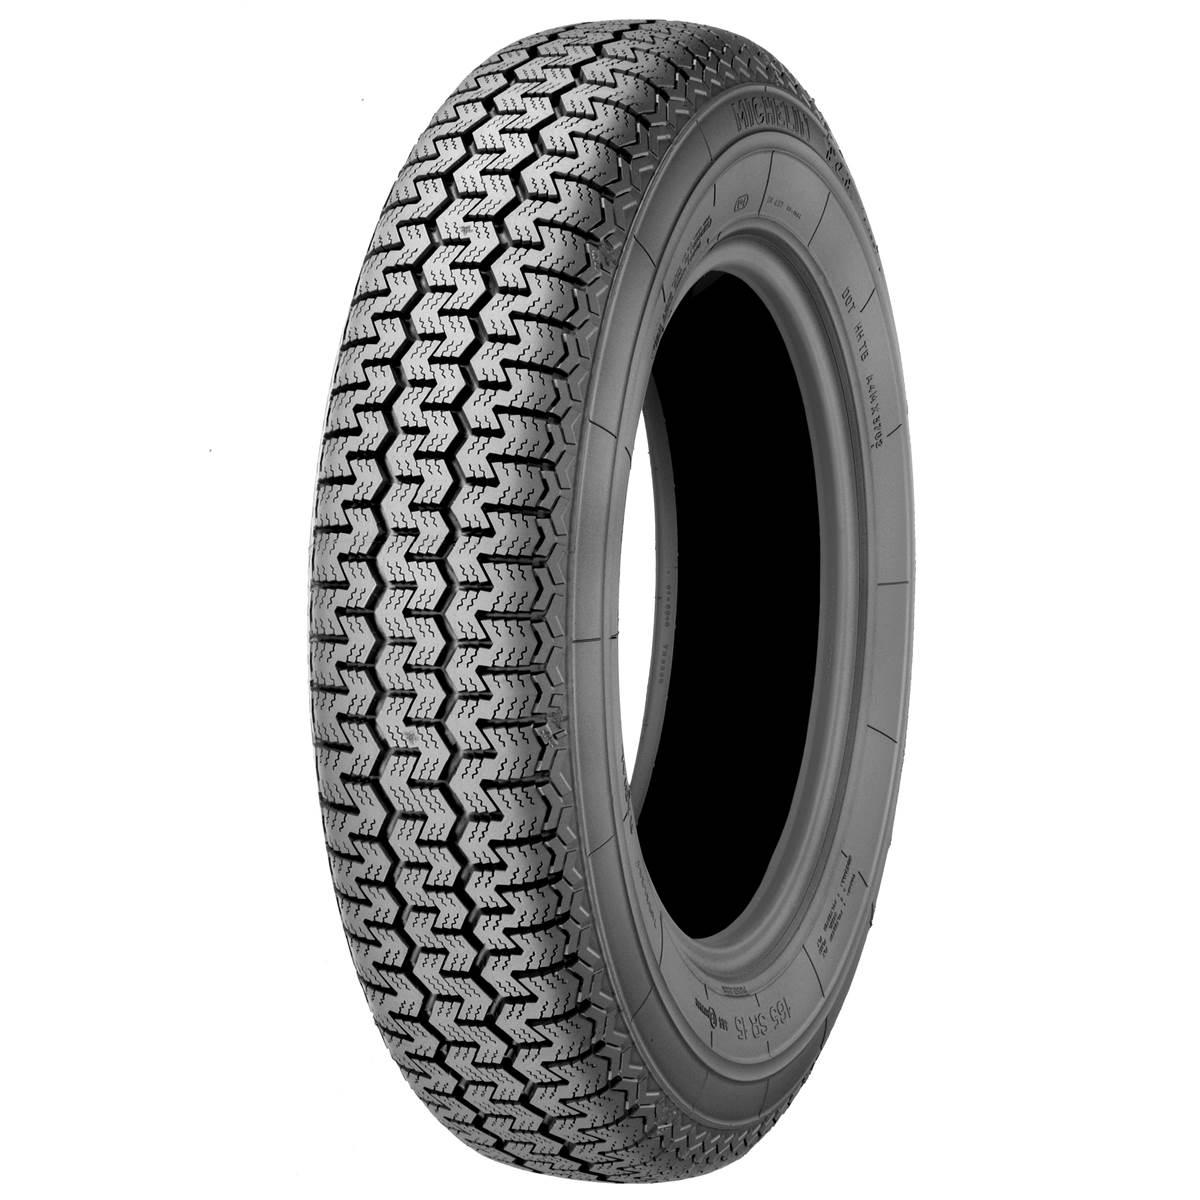 Pneu Michelin Collection 145/80R15 78S Xzx